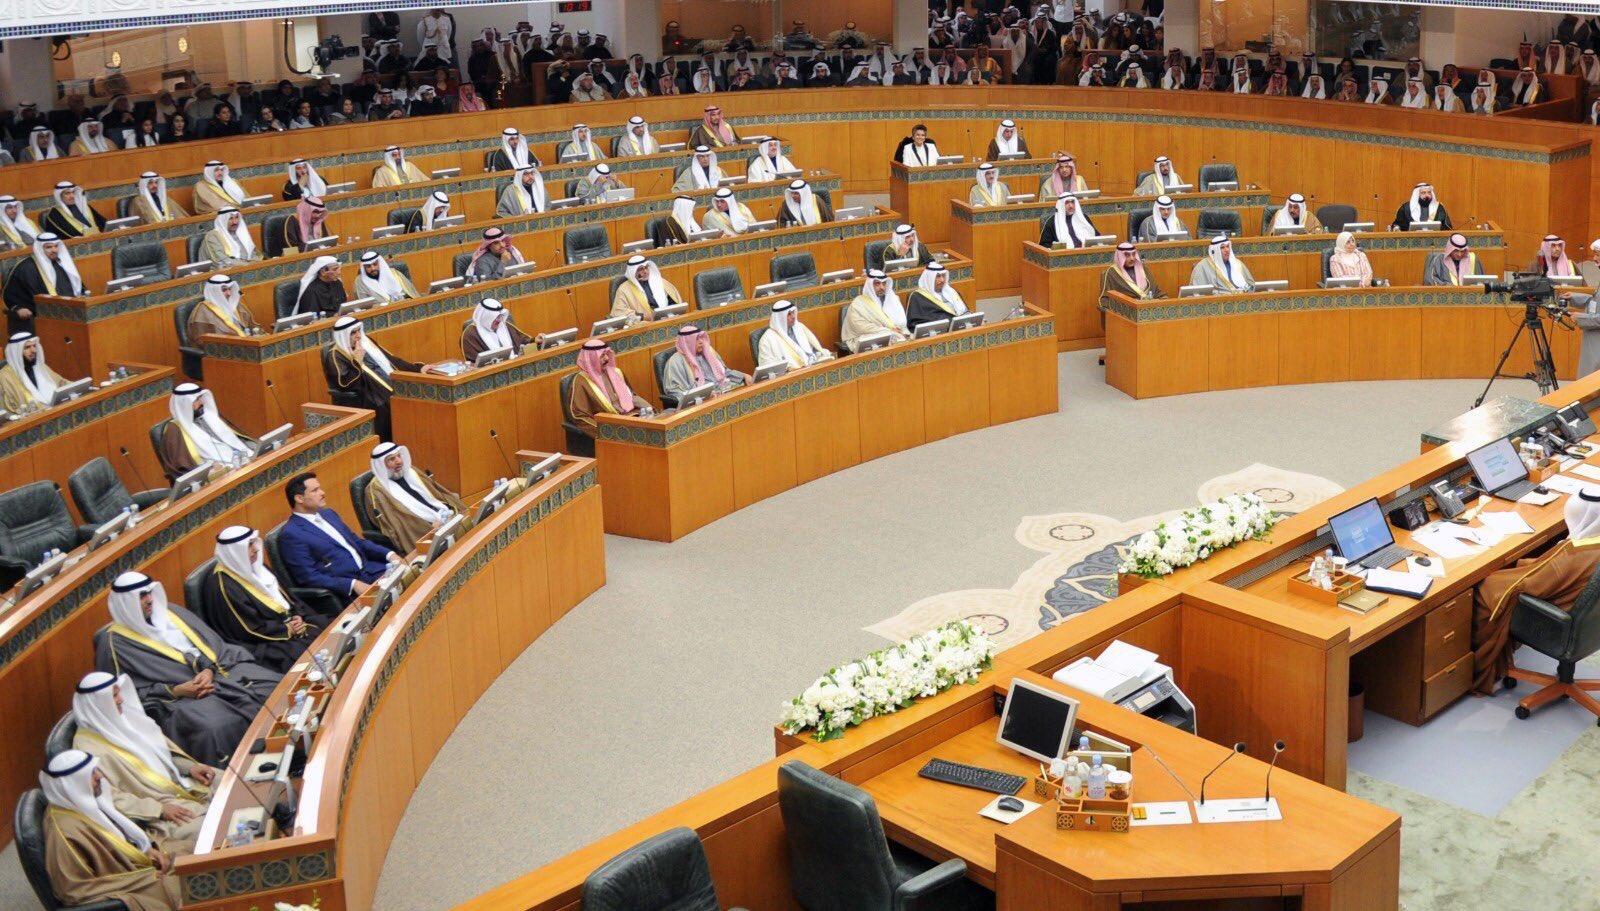 IMG ٢٠١٧٠٩٢٥ ١٤٢٦١٩ - 3 طلبات تتعلق ب البدون و أزمة الوظائف الحكومية و تزوير الجناسي على طاولة المجلس الثلاثاء